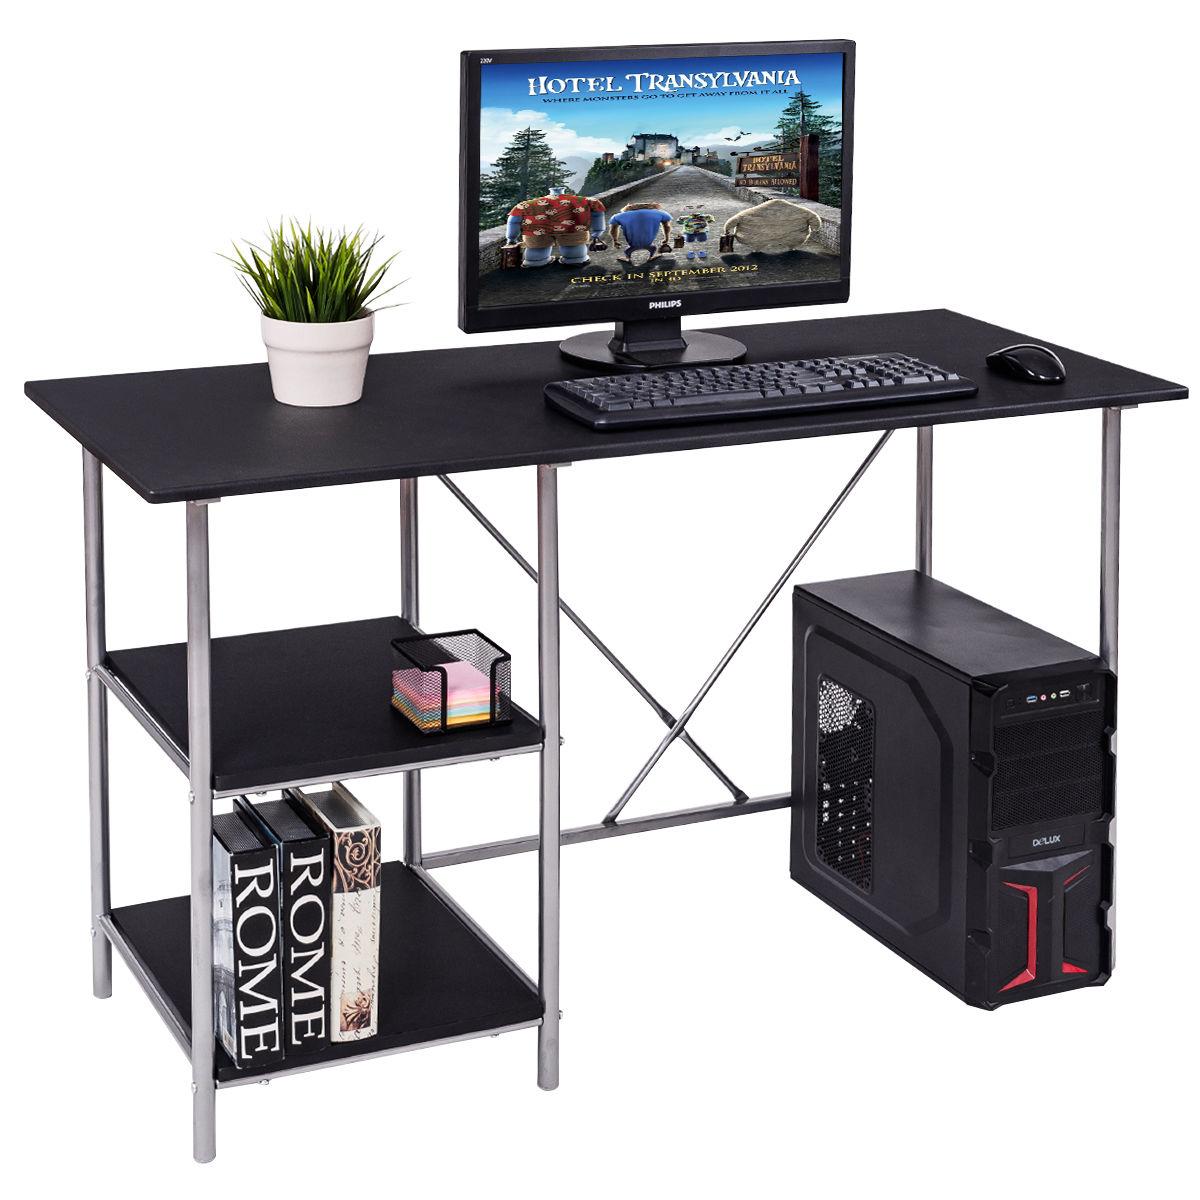 цена на Giantex Computer Desk PC Laptop Table Modern Workstation with Shelves Study Writing Home Office Furniture HW55394